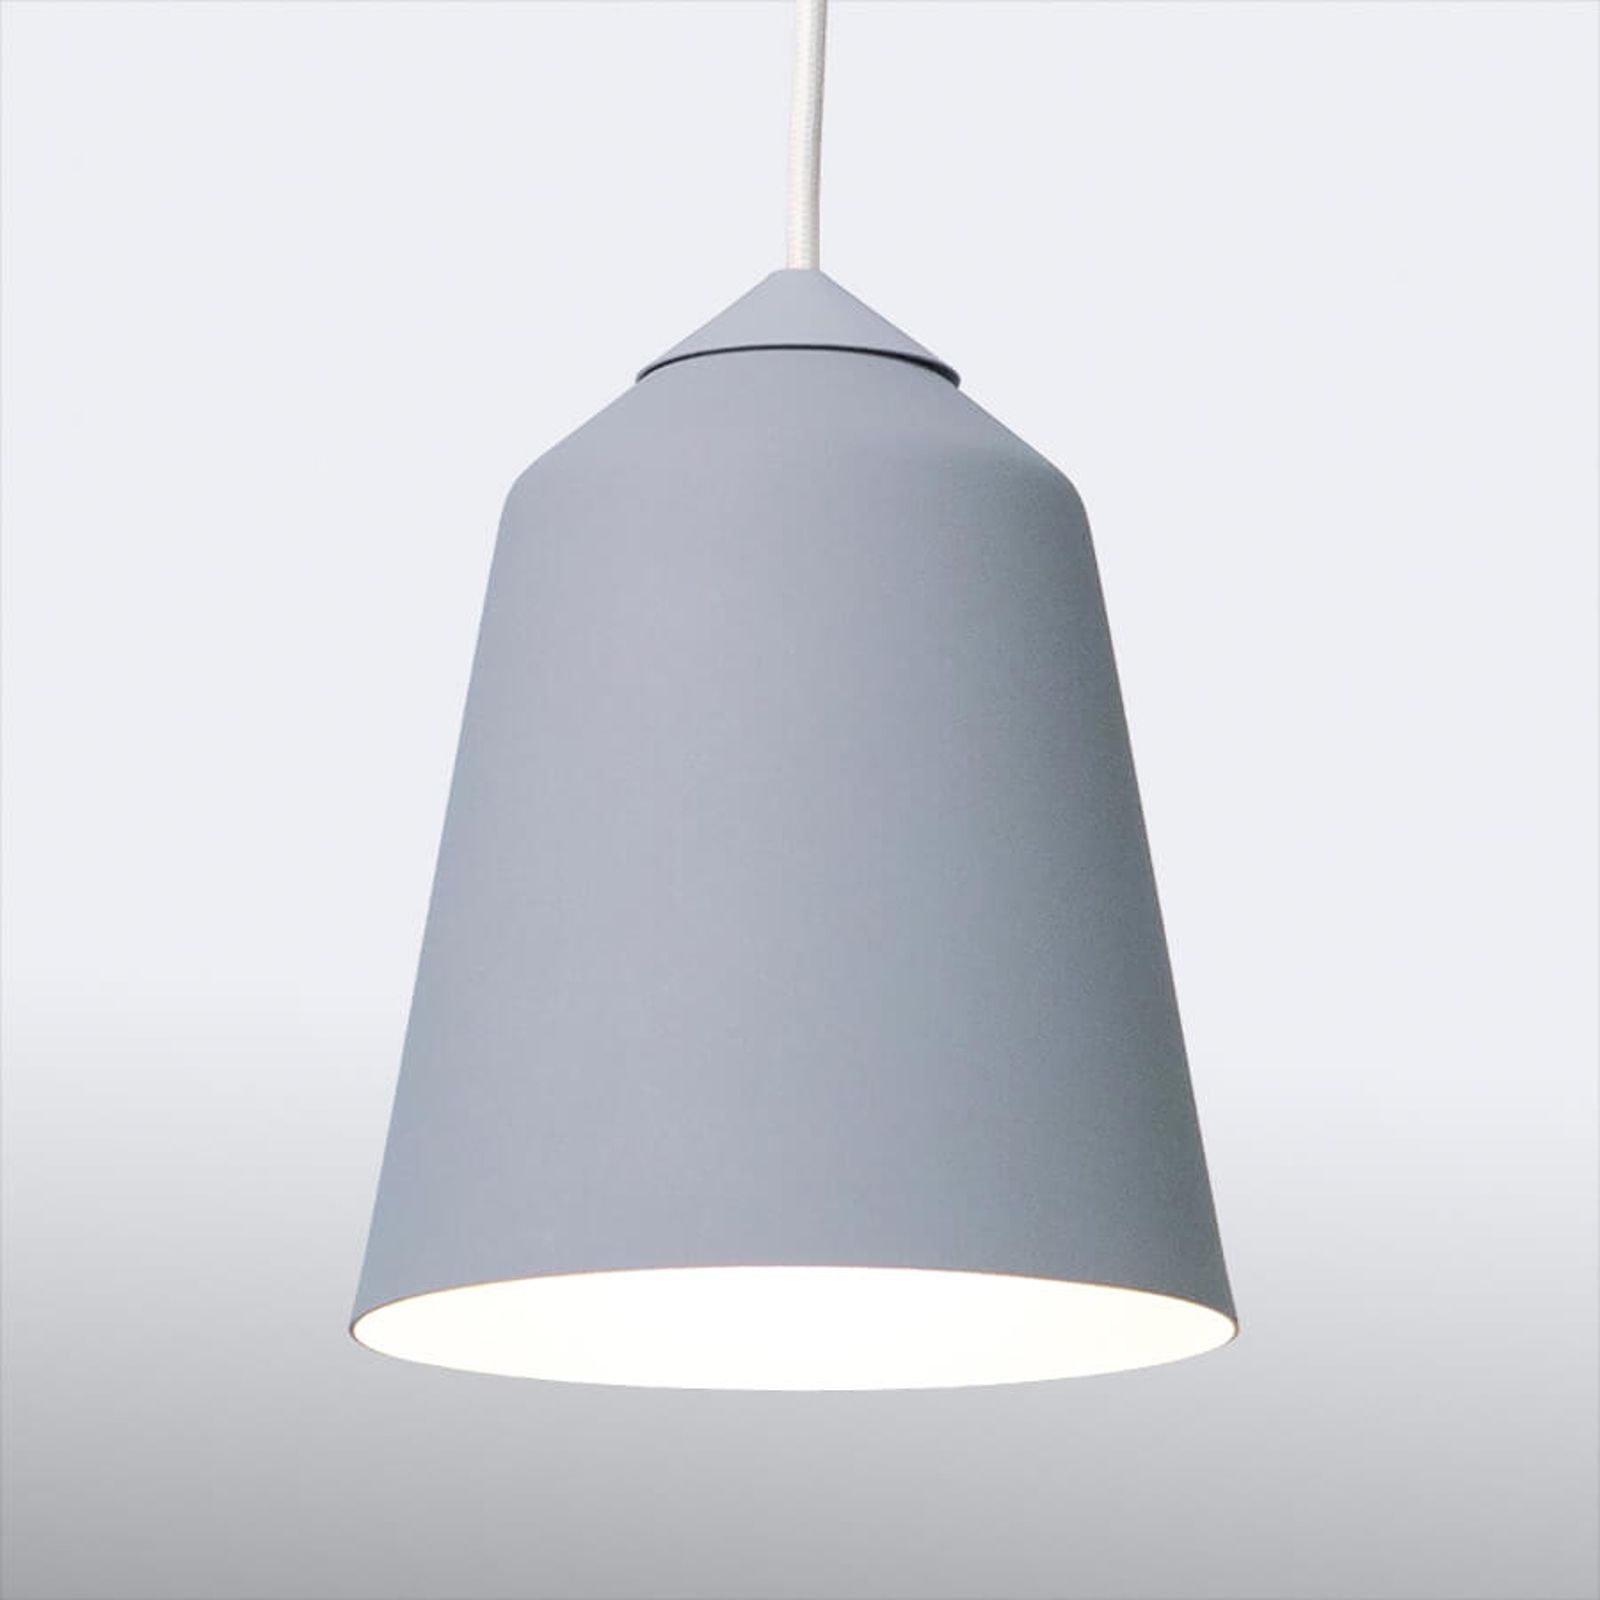 Innermost Circus - hanglamp, grijs-wit, 15 cm